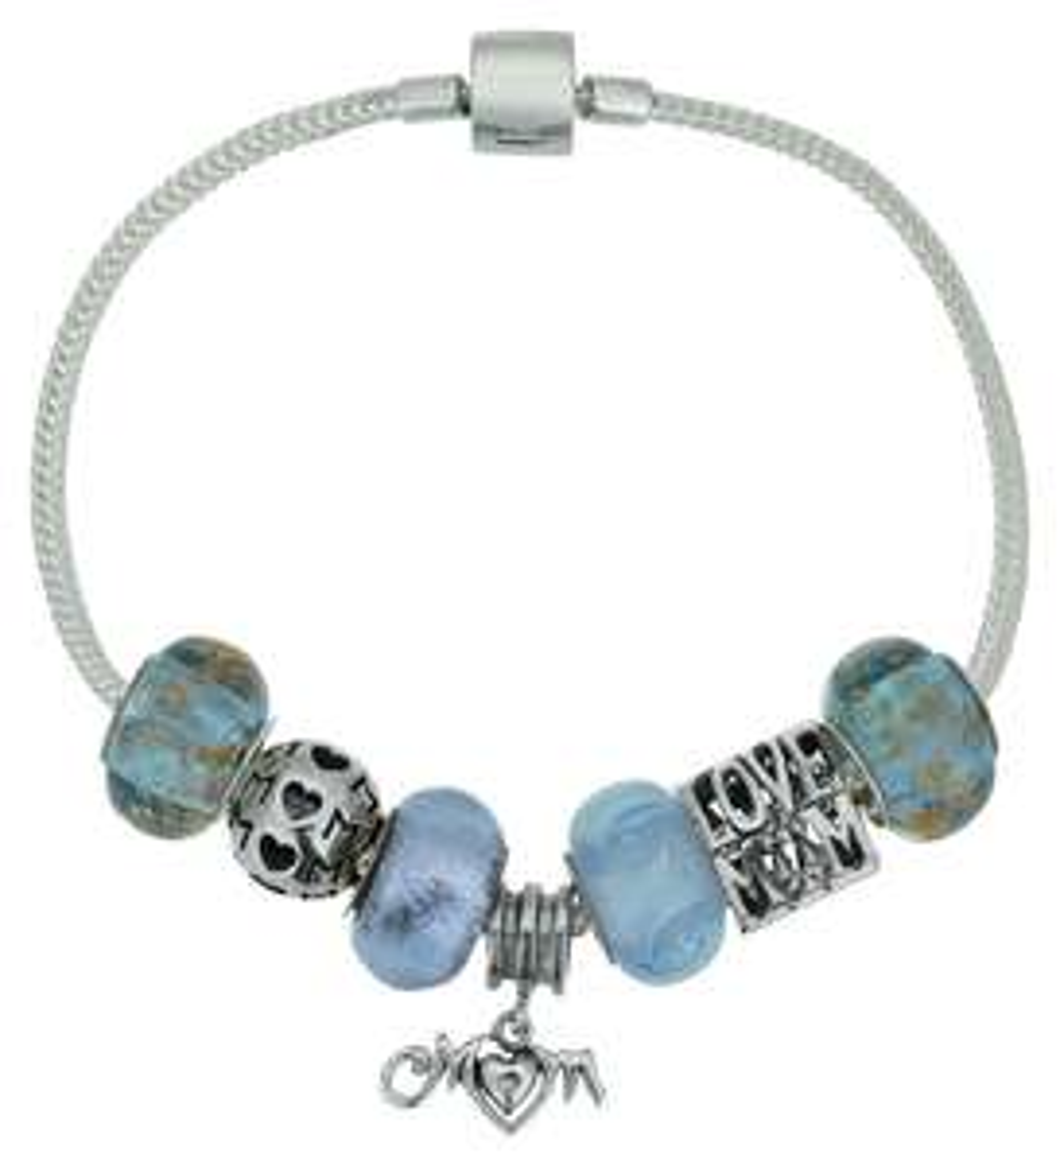 STERLING SILVER lilac/blue MUM bracelet - £6.99 @ Argos